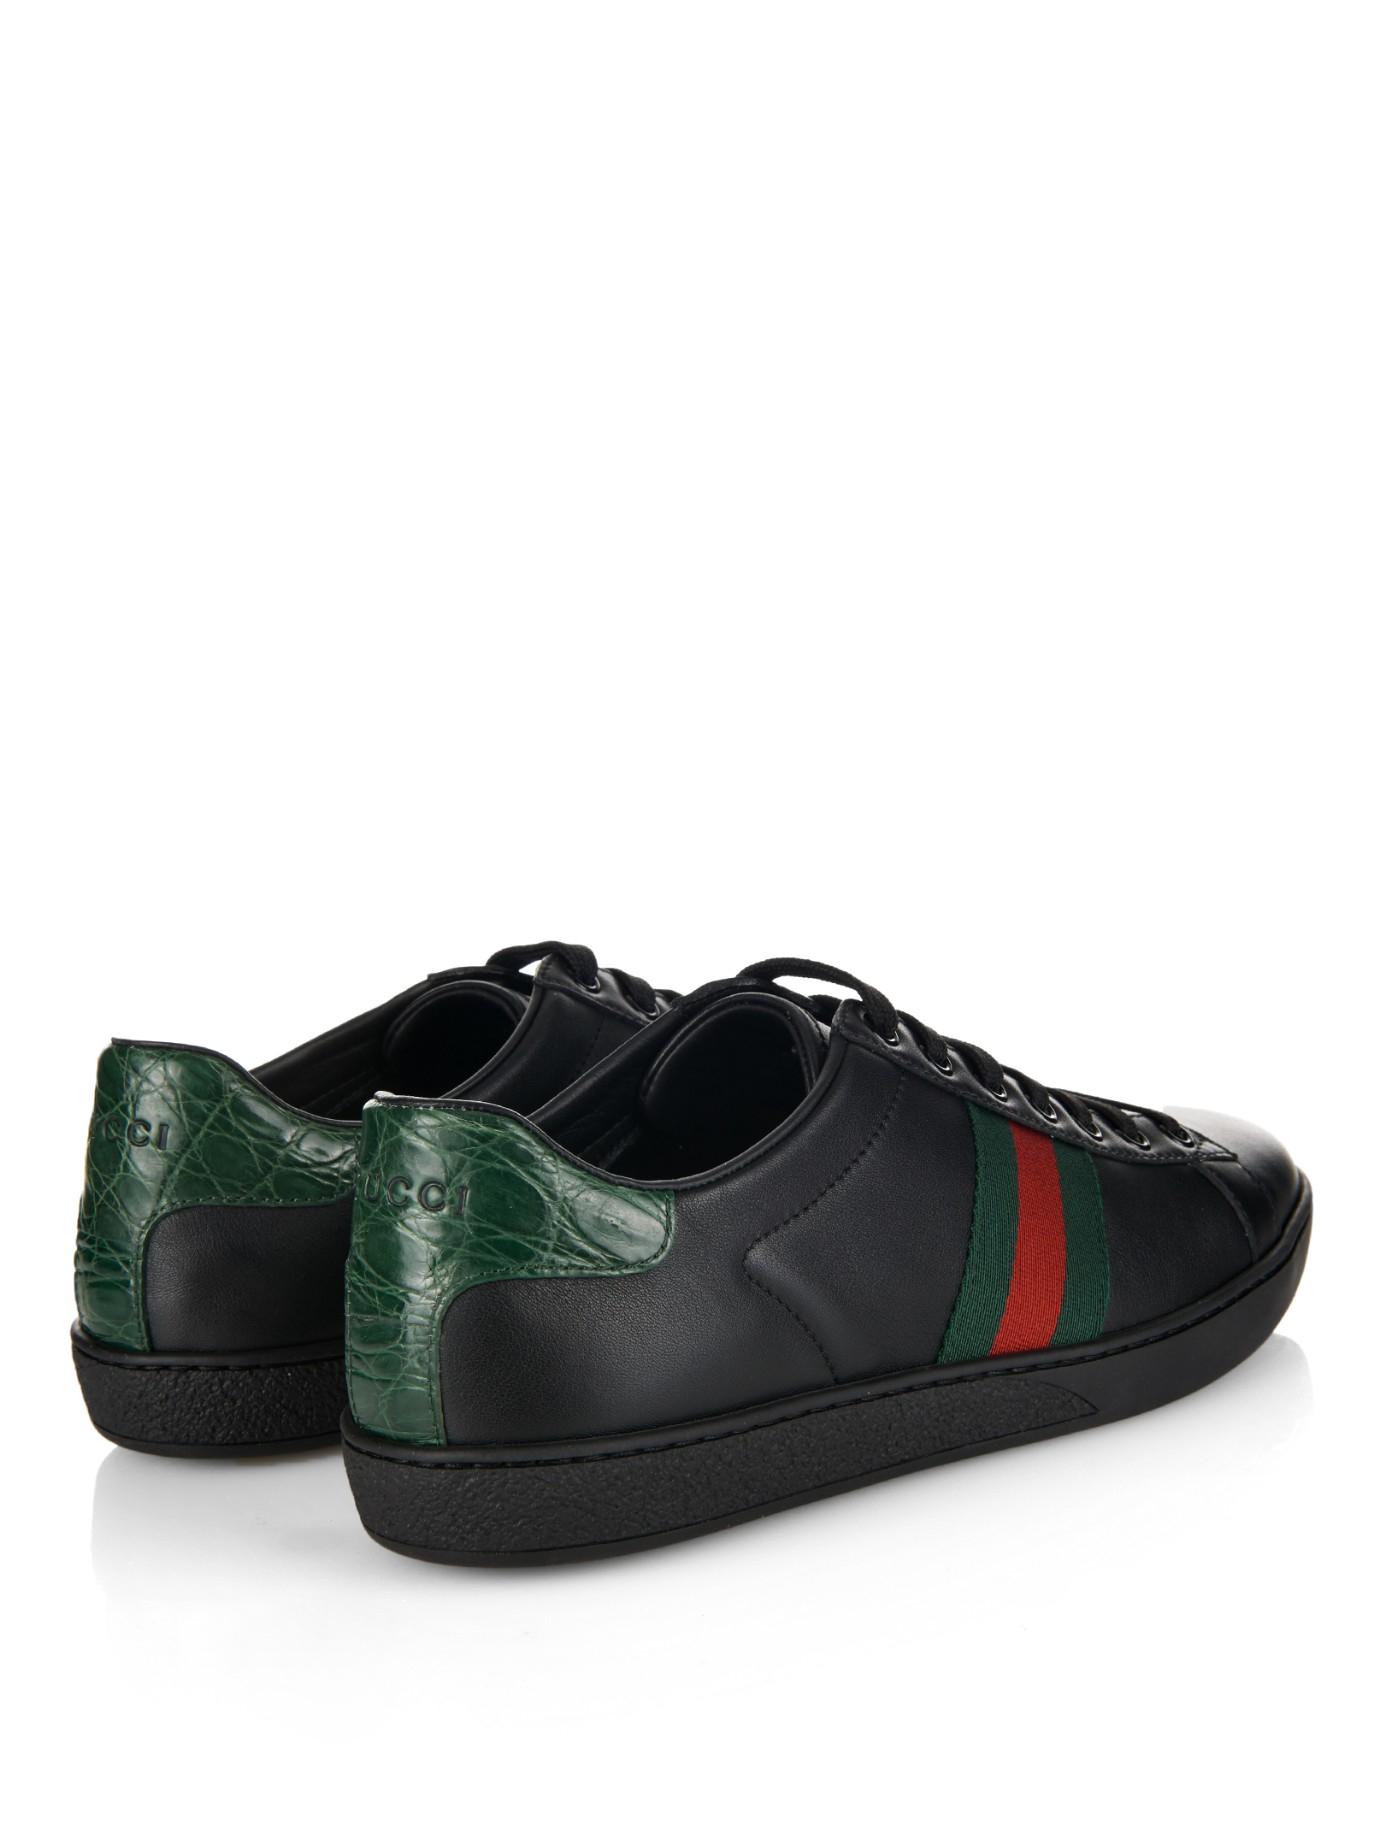 37e5159eb517 Lyst - Gucci Web-Stripe Low-Top Leather Trainers in Black